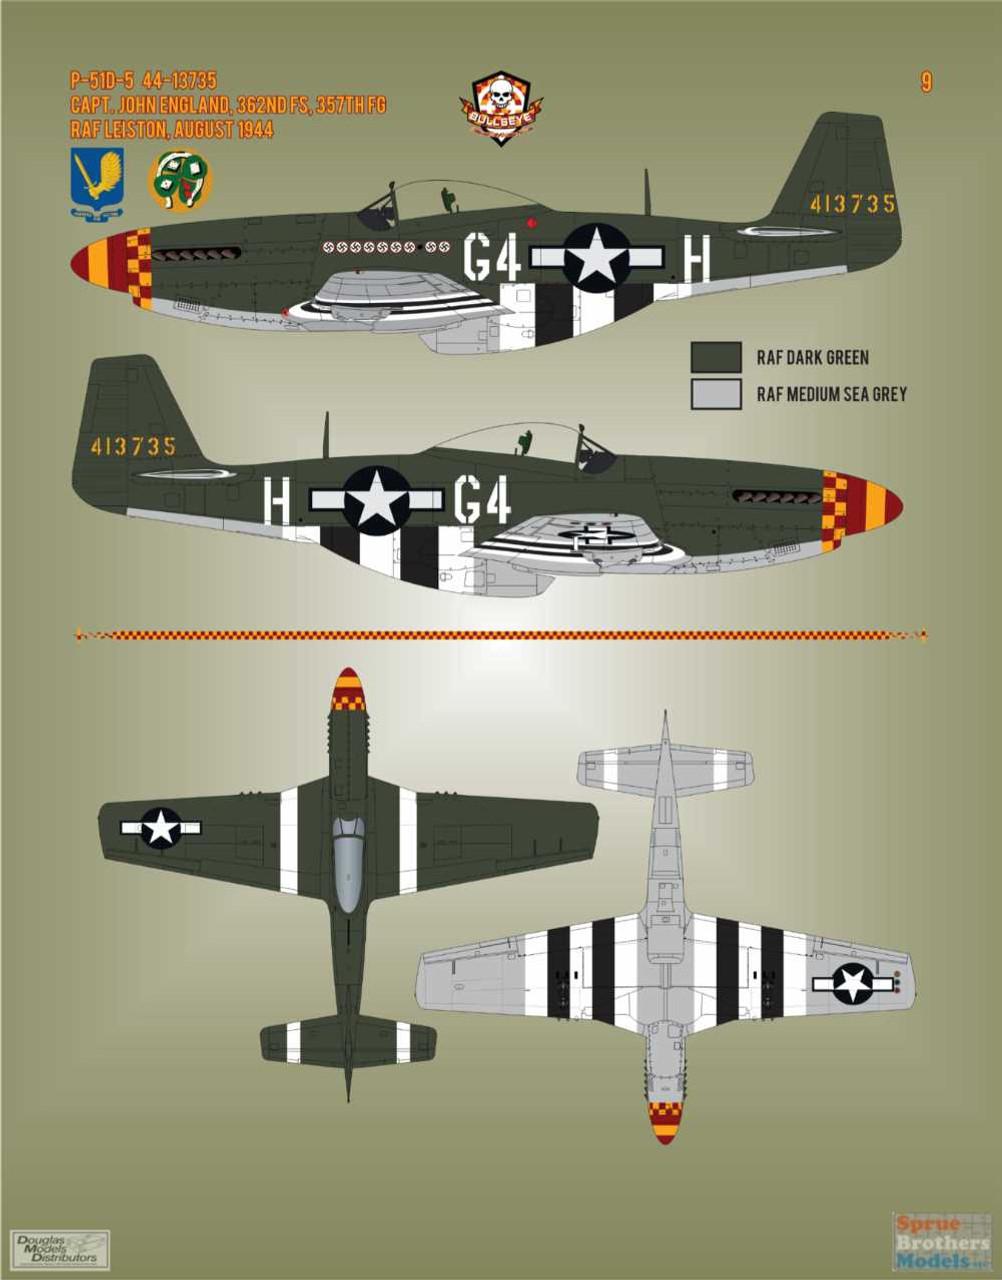 BMA48010 1:48 Bullseye Model Aviation Decals - P-51D Mustang Yoxford Boys #2